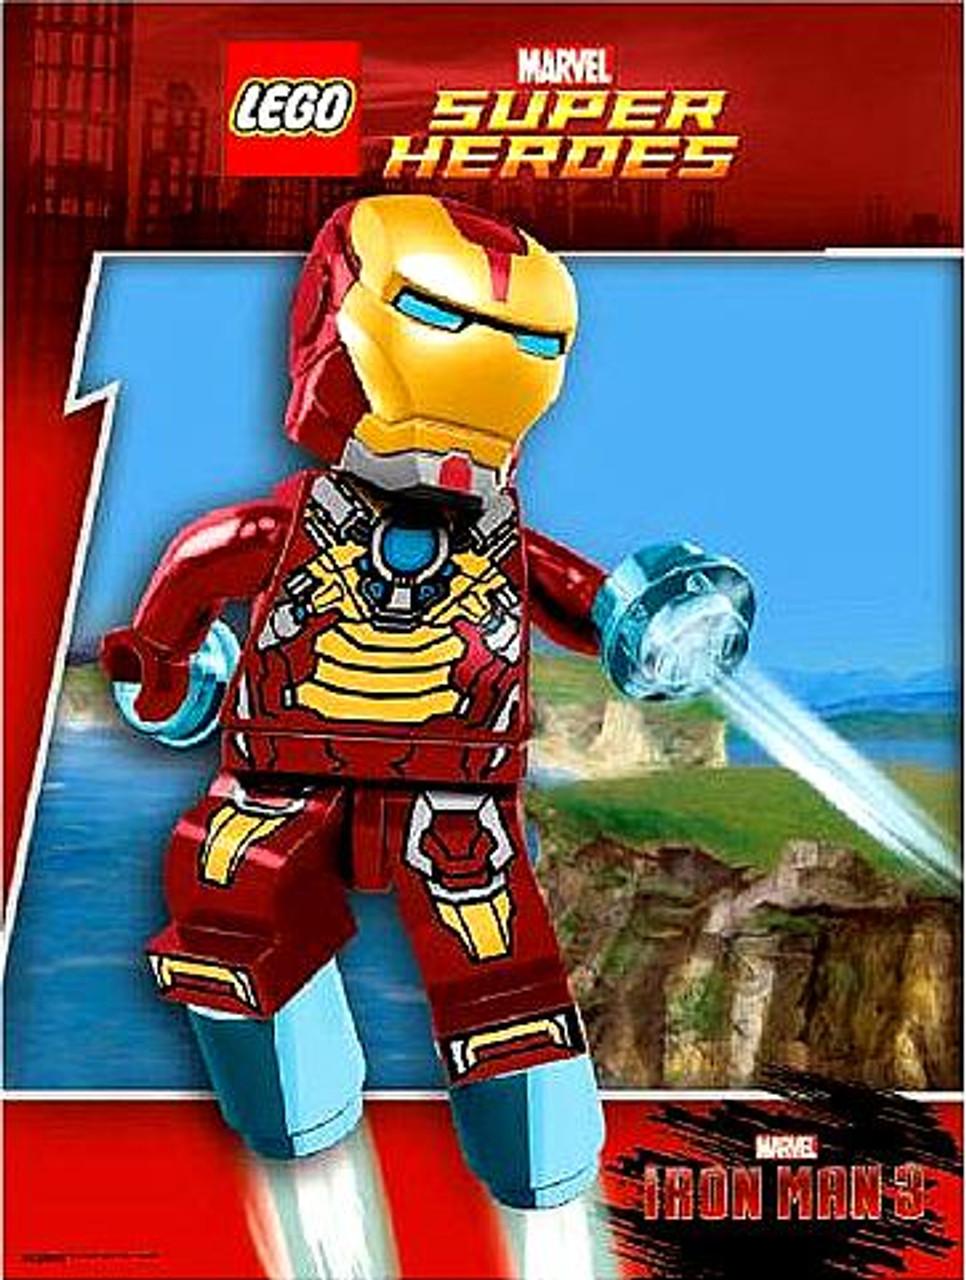 Marvel Super Heroes LEGO Iron Man 3 Poster